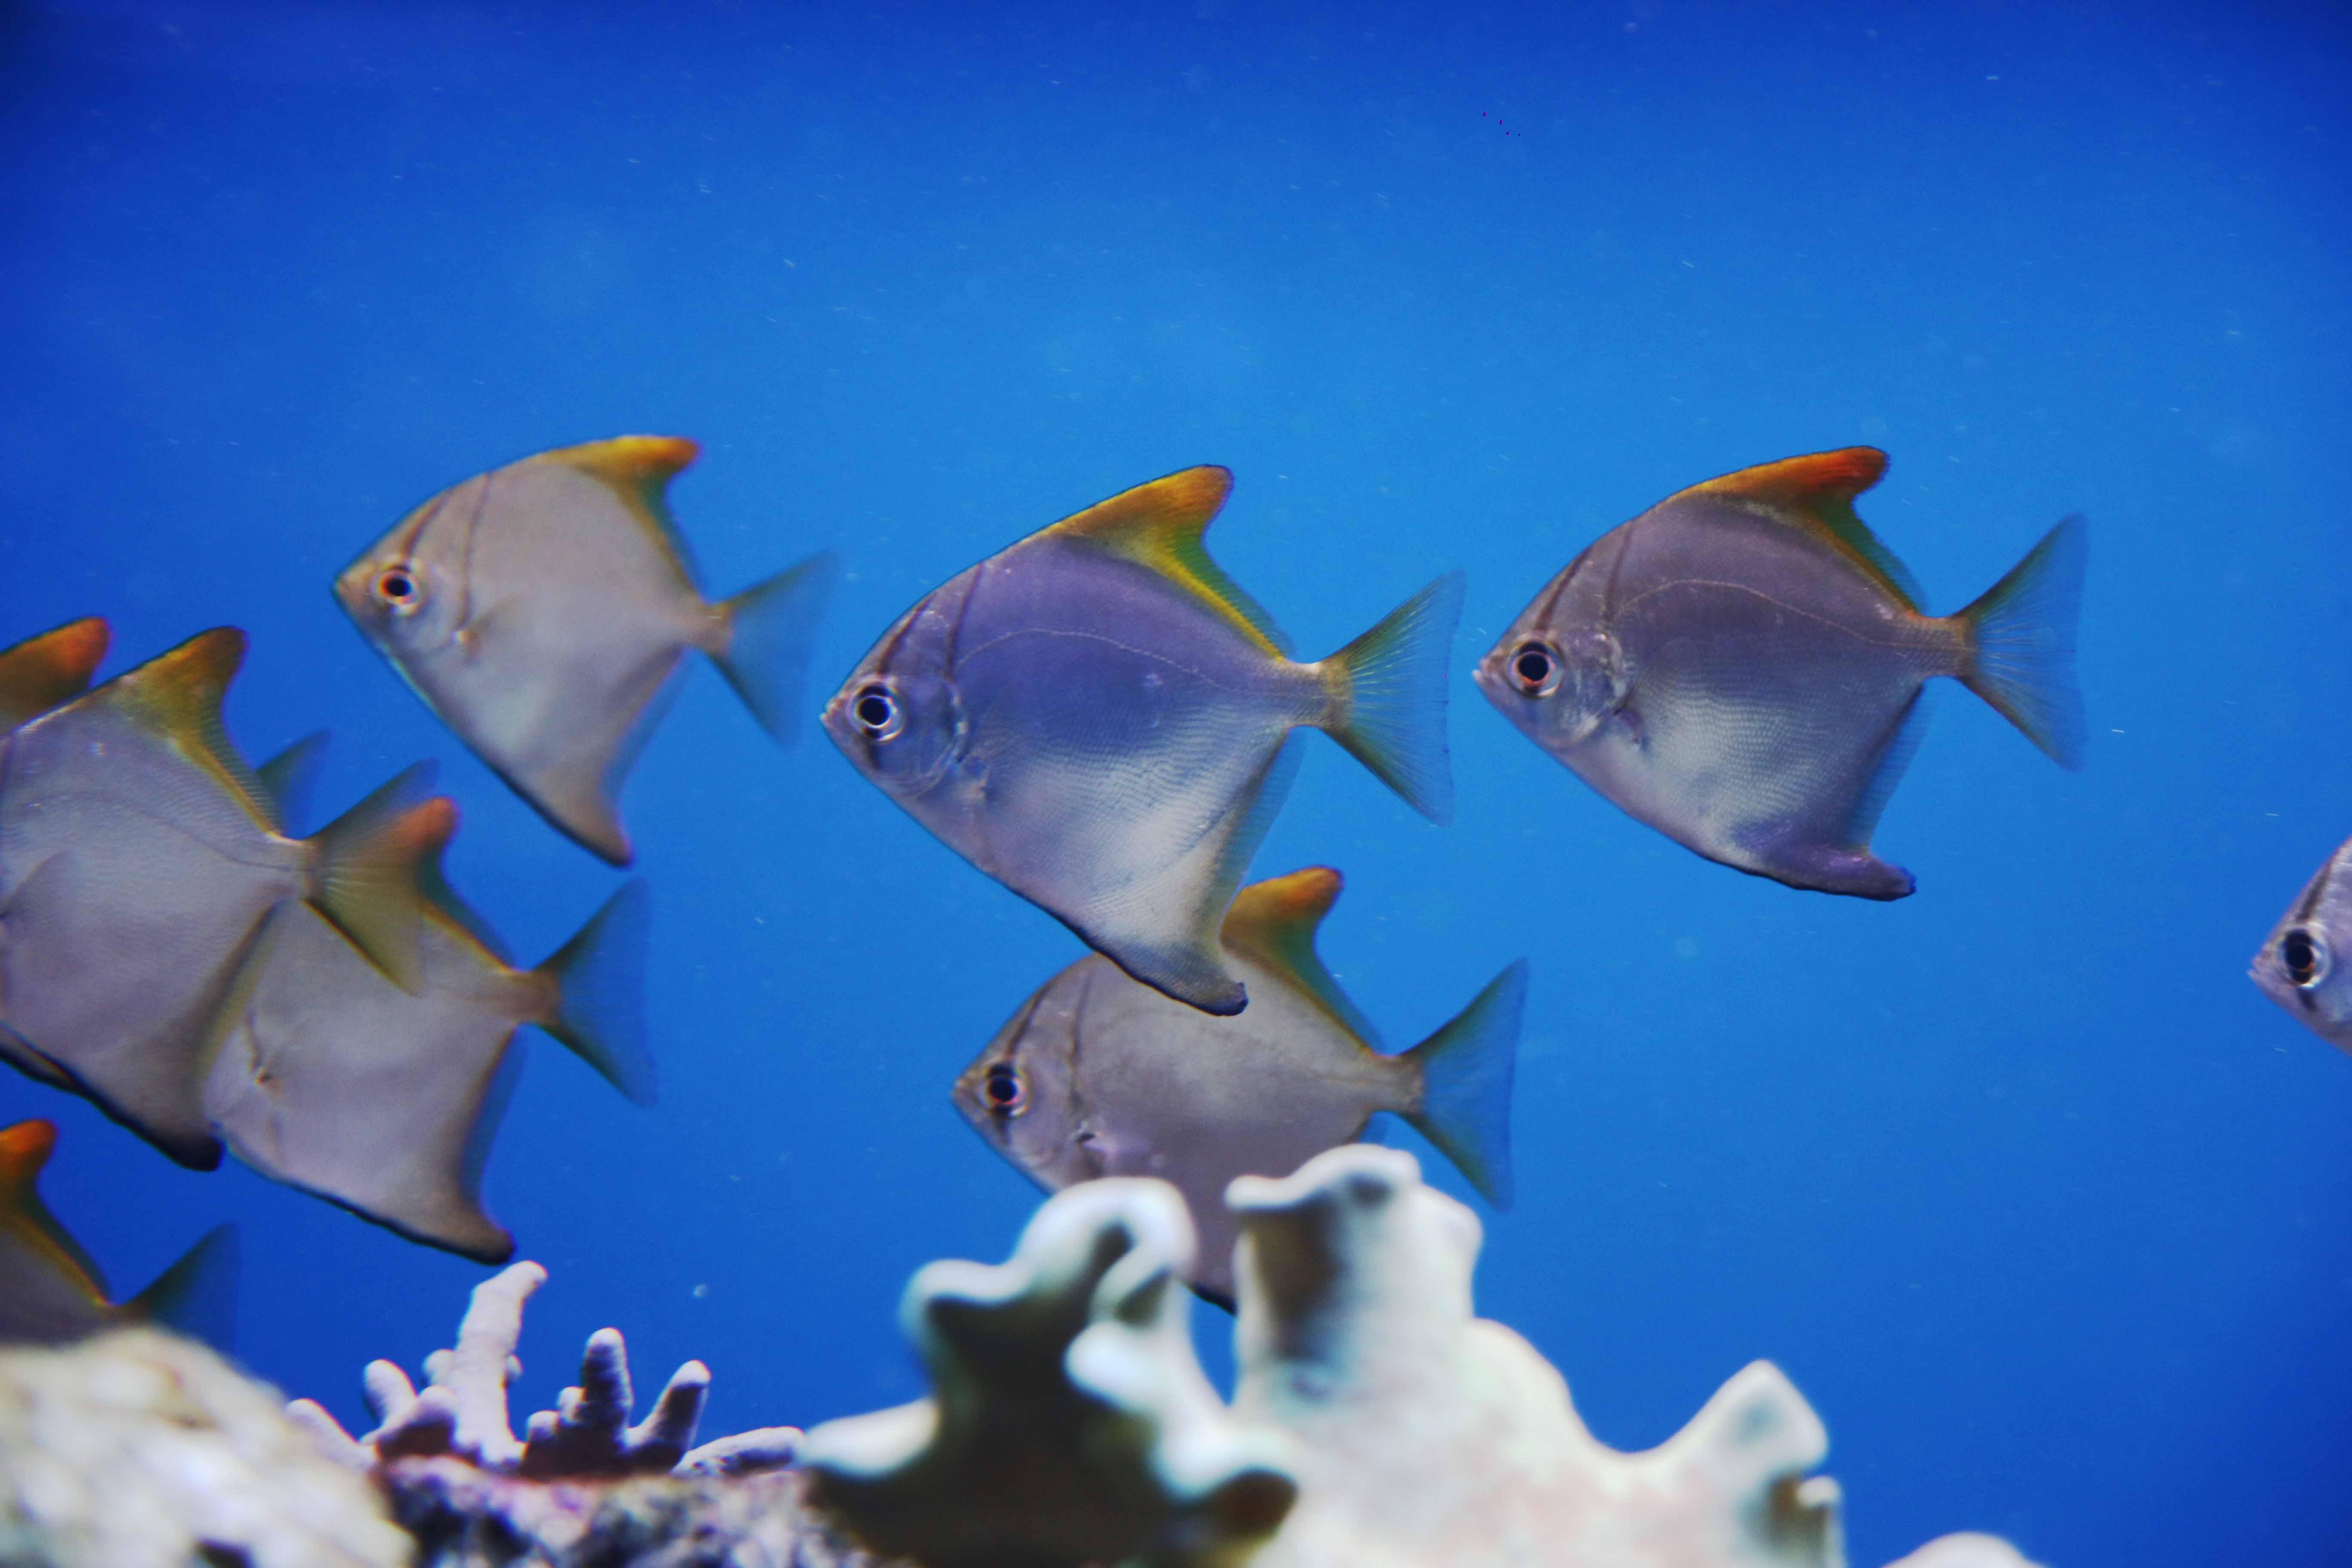 Coral-eating fish